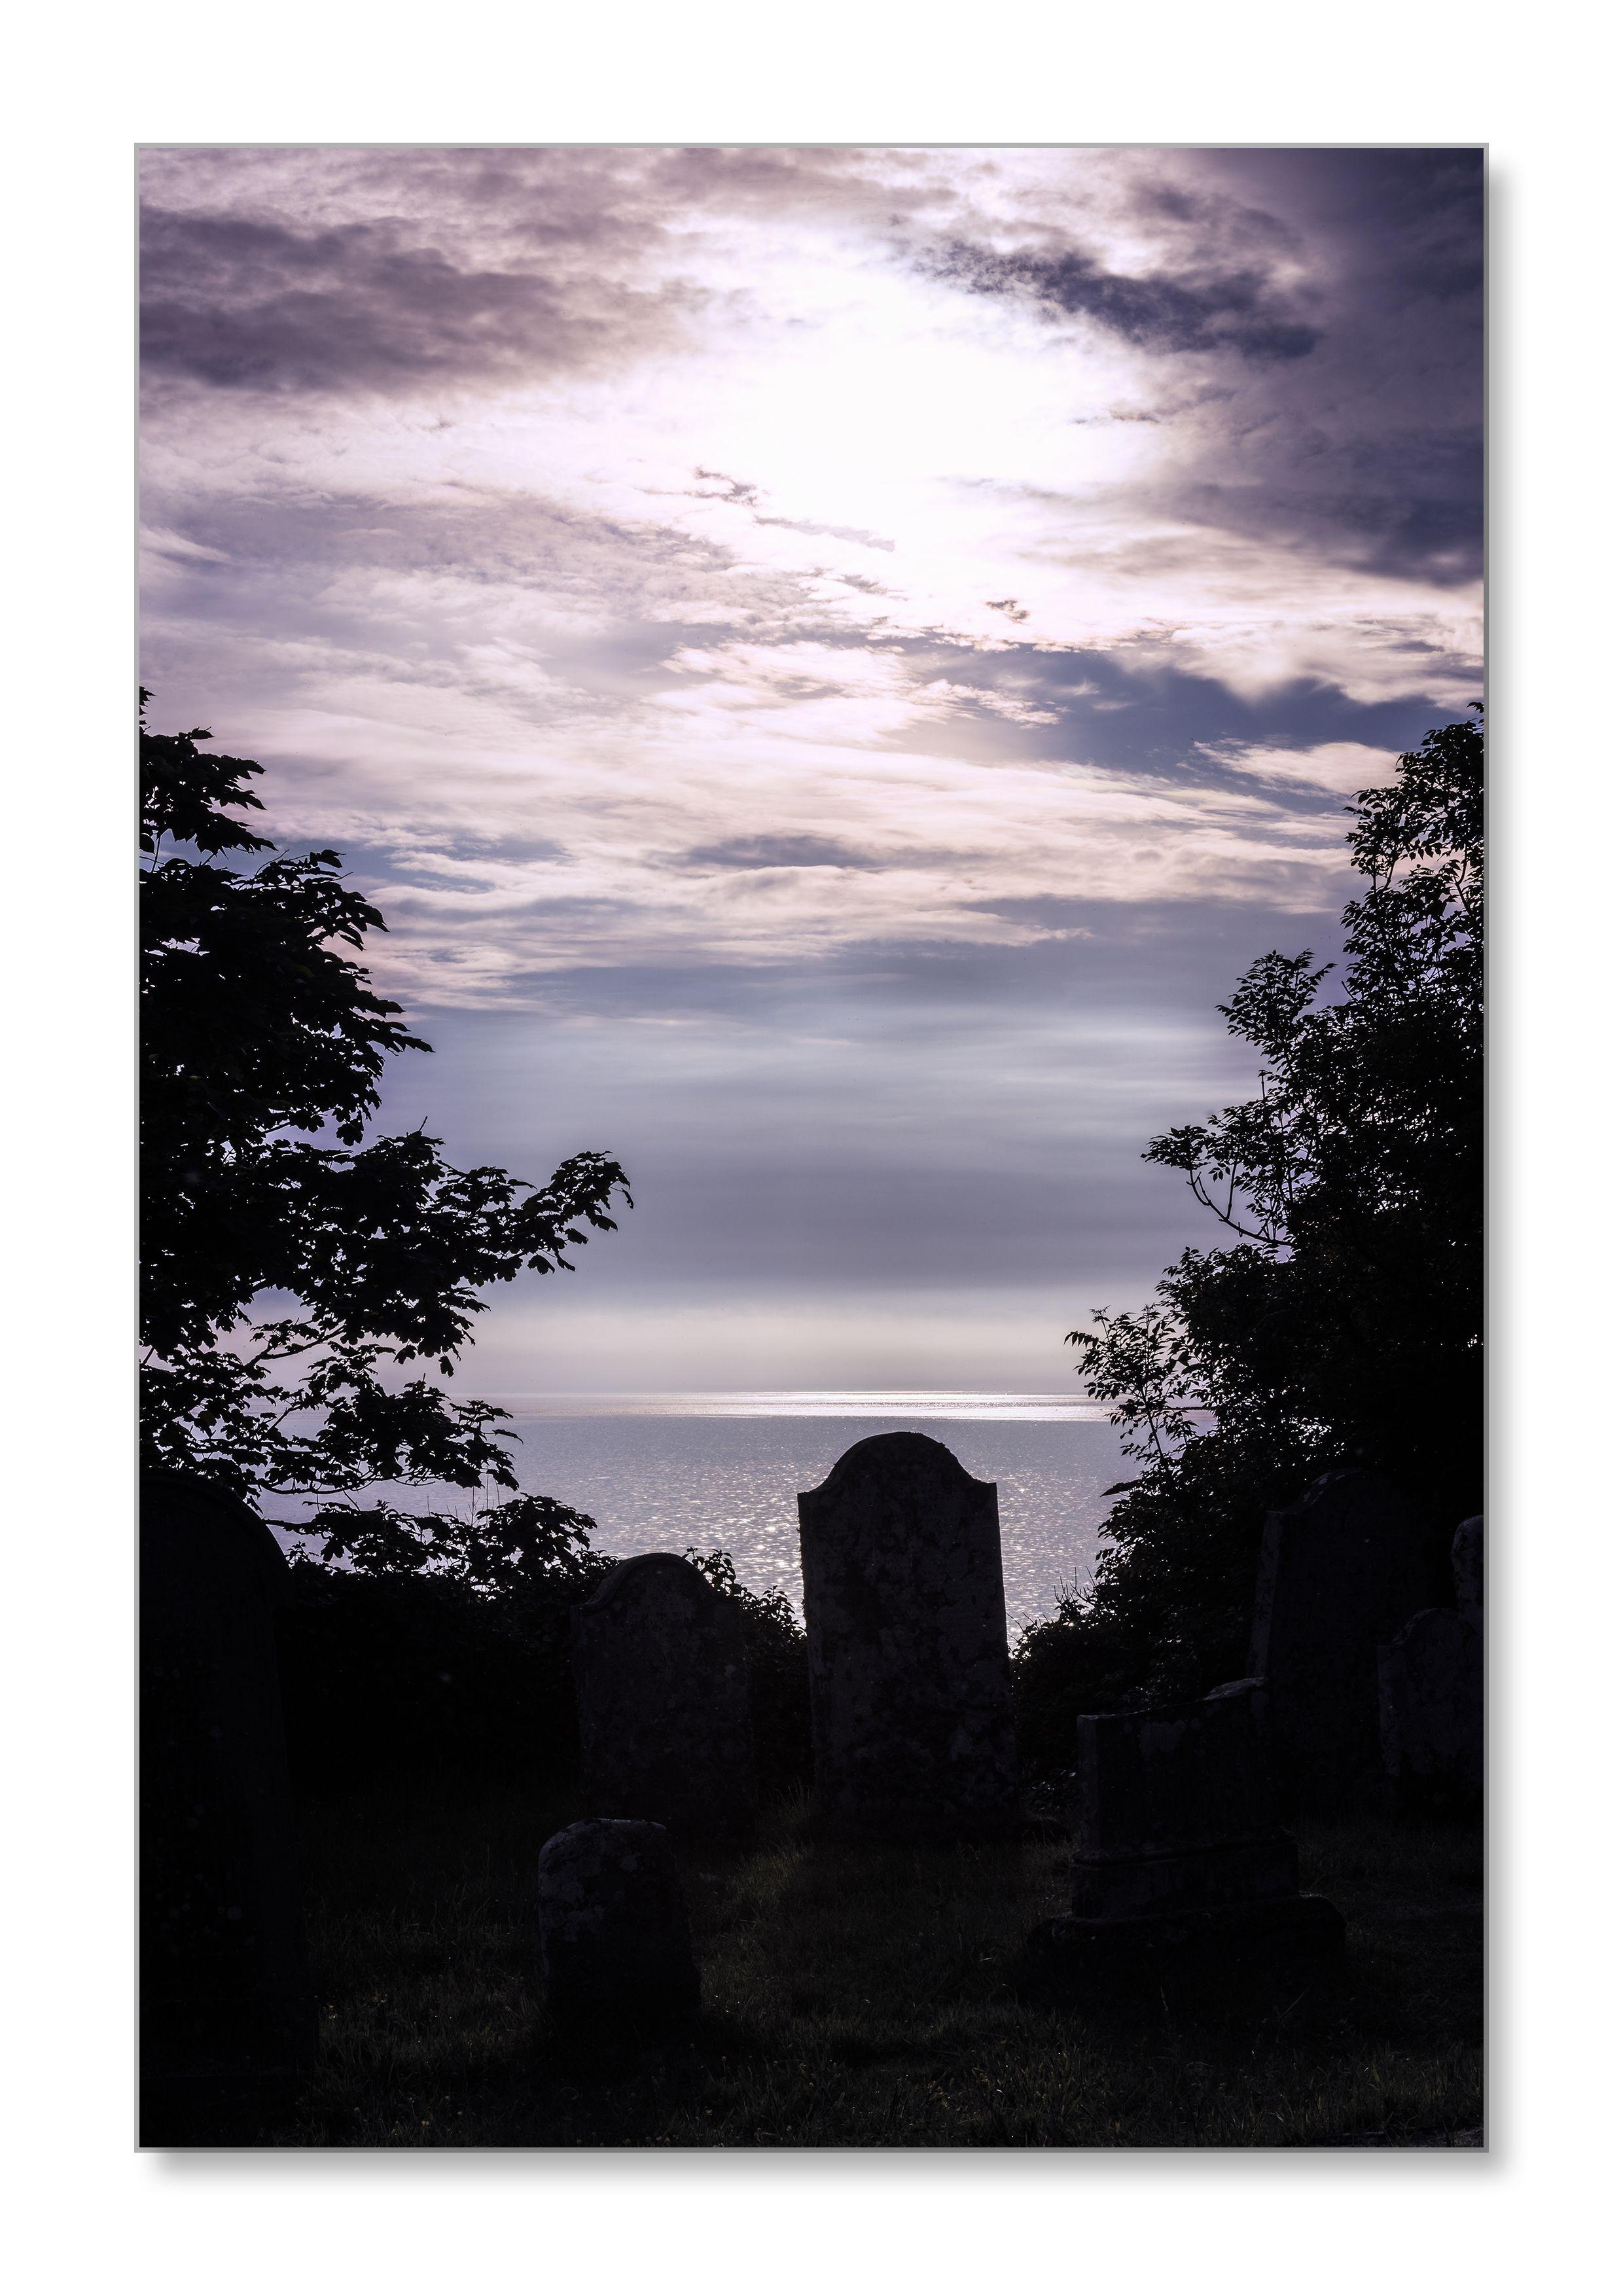 Kirkmaiden - Monreith  Lying on Monreith Bay are the ruins